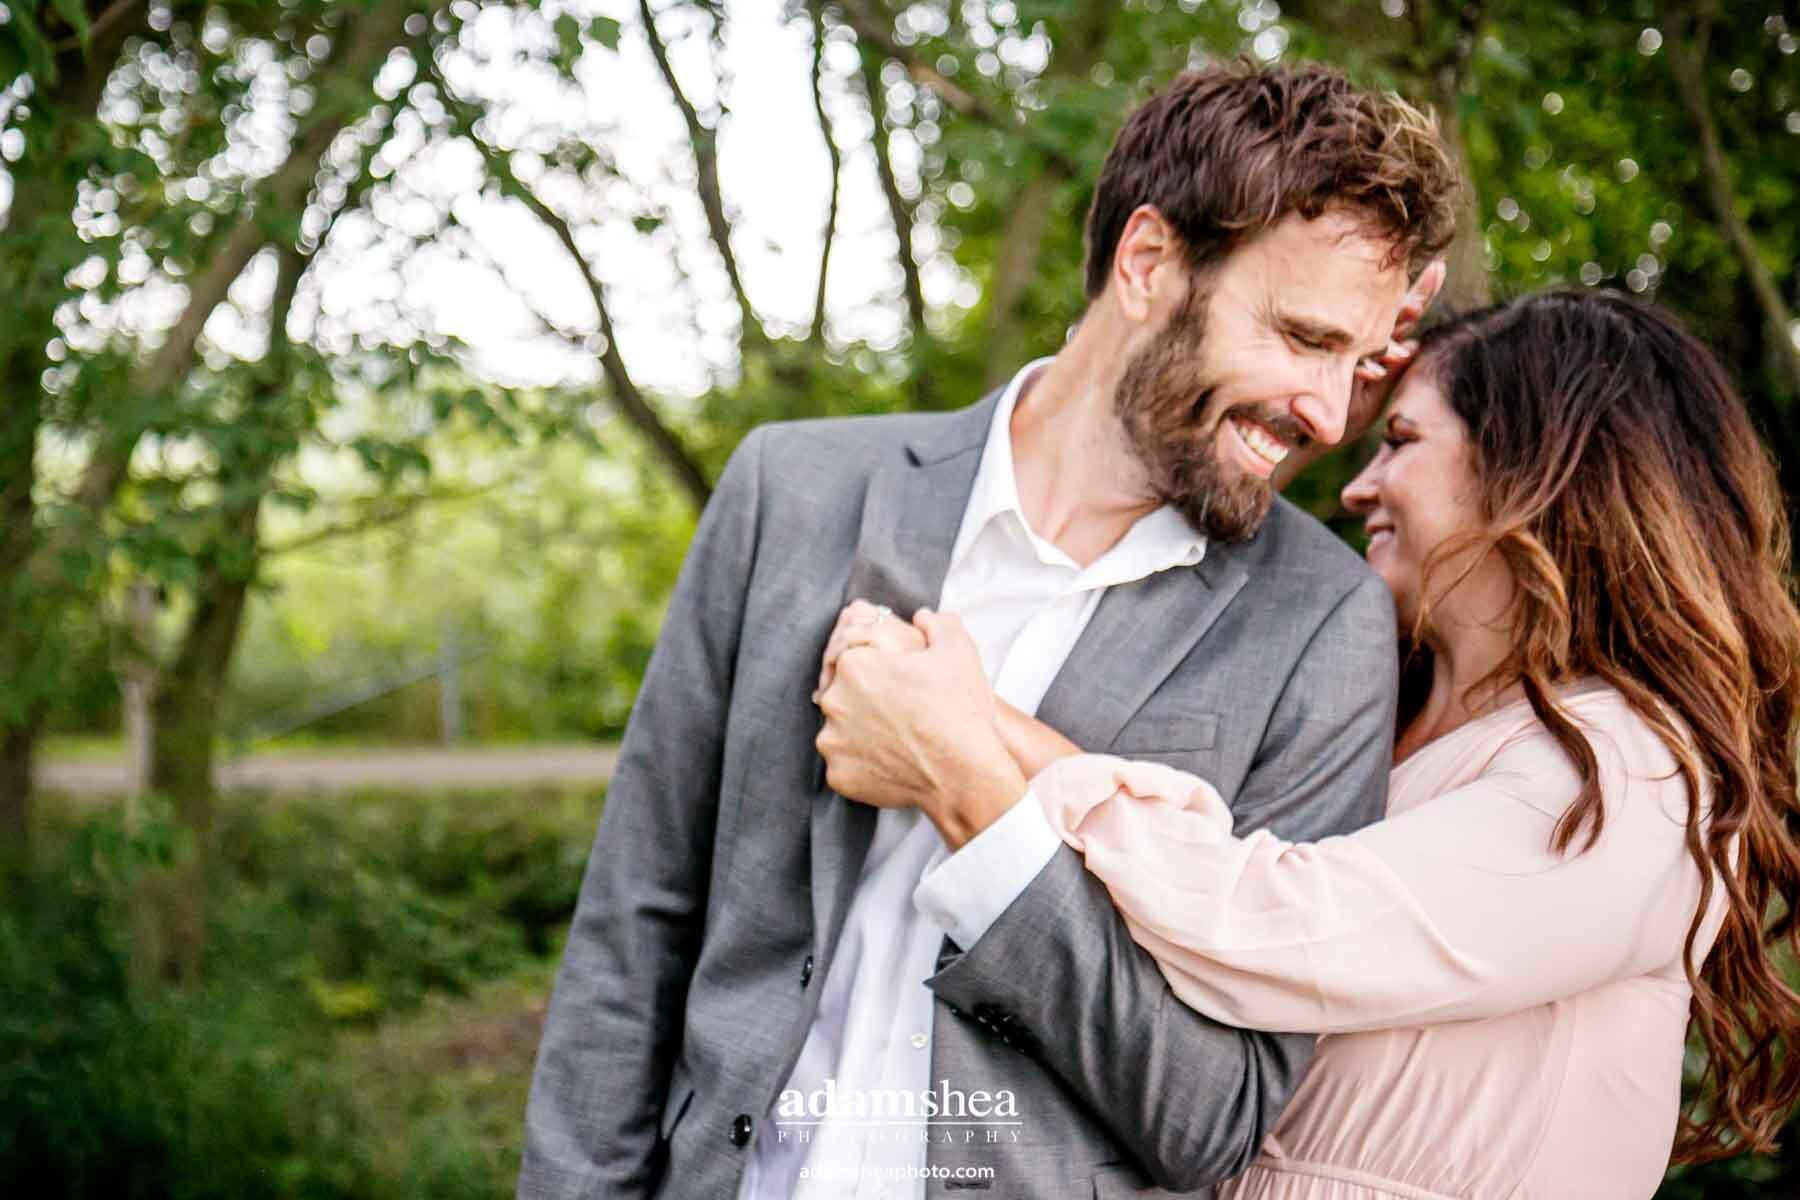 amy-adam-engagement-photos-larsen-wi-neenah-winding-trail-flowy-dress-grey-suit-adam-shea-photography-green-bay-appleton-neenah-photographer-9.jpg